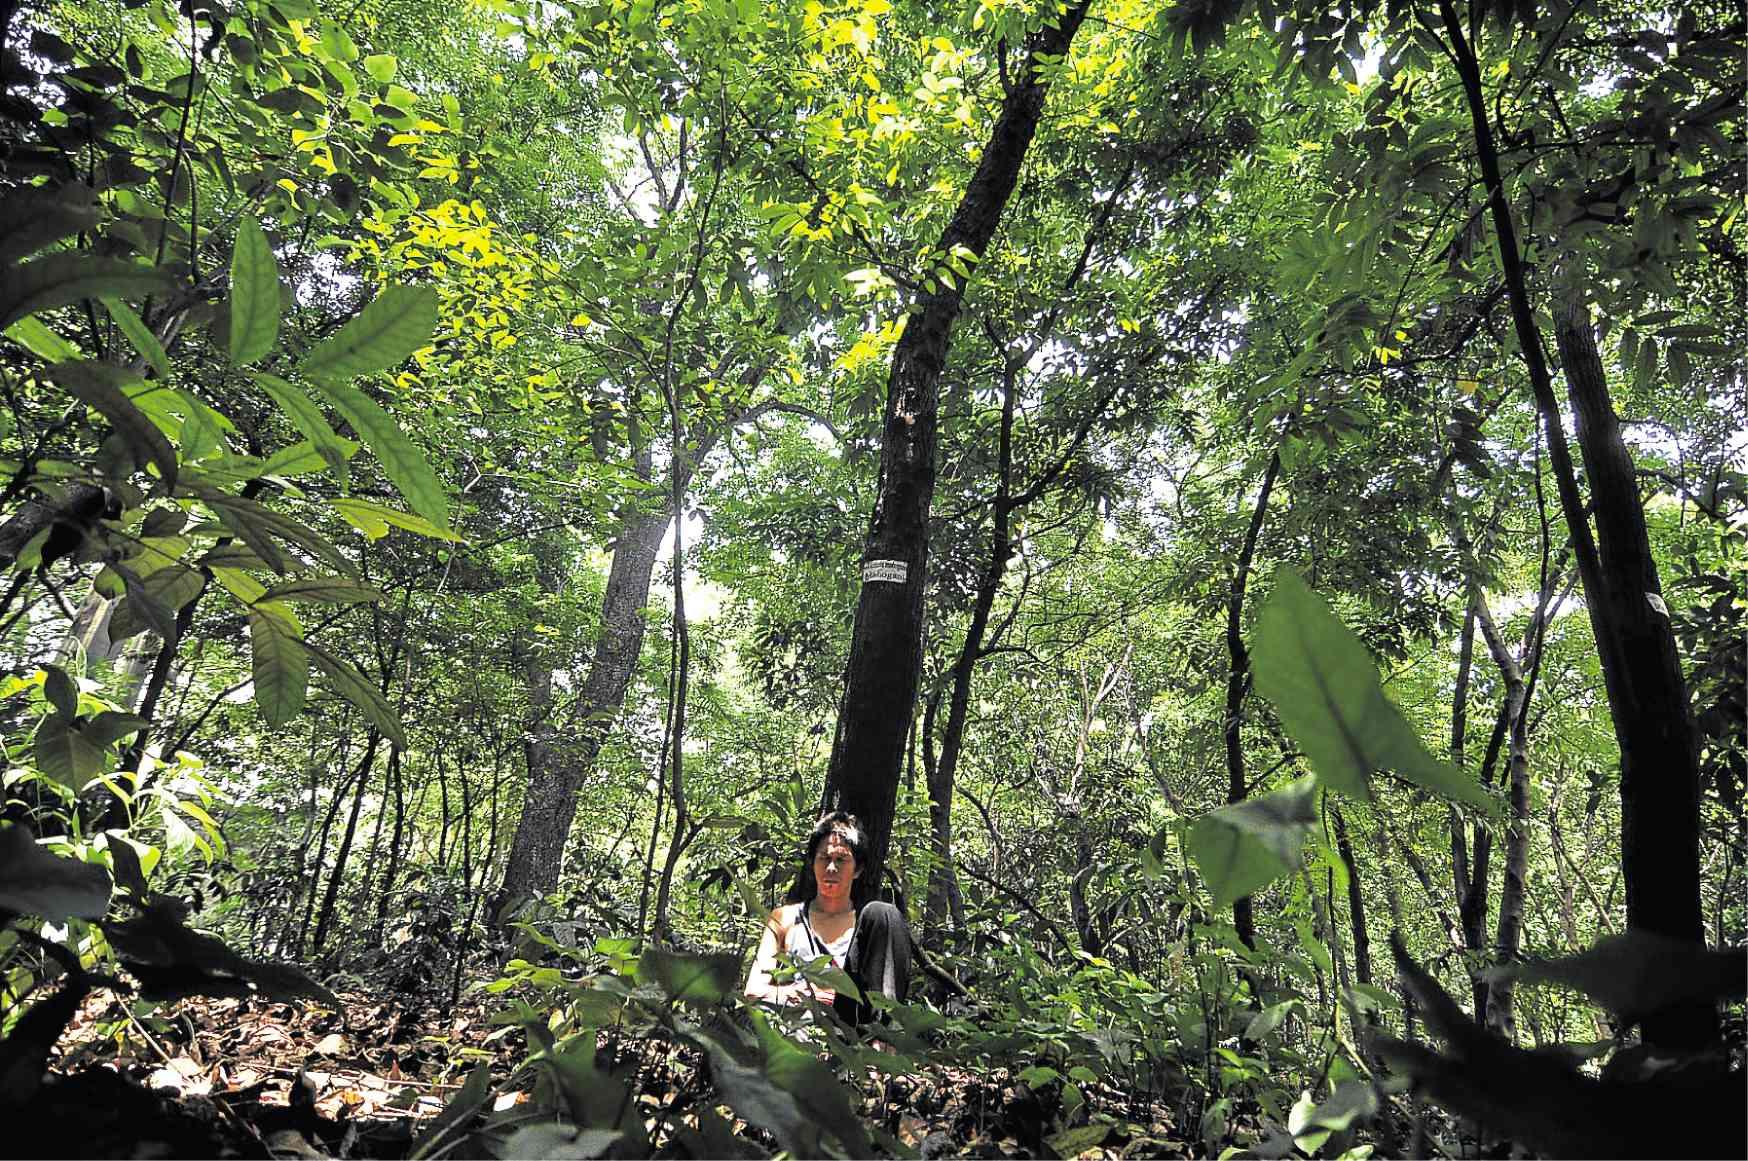 nolisoli arroceros forest park